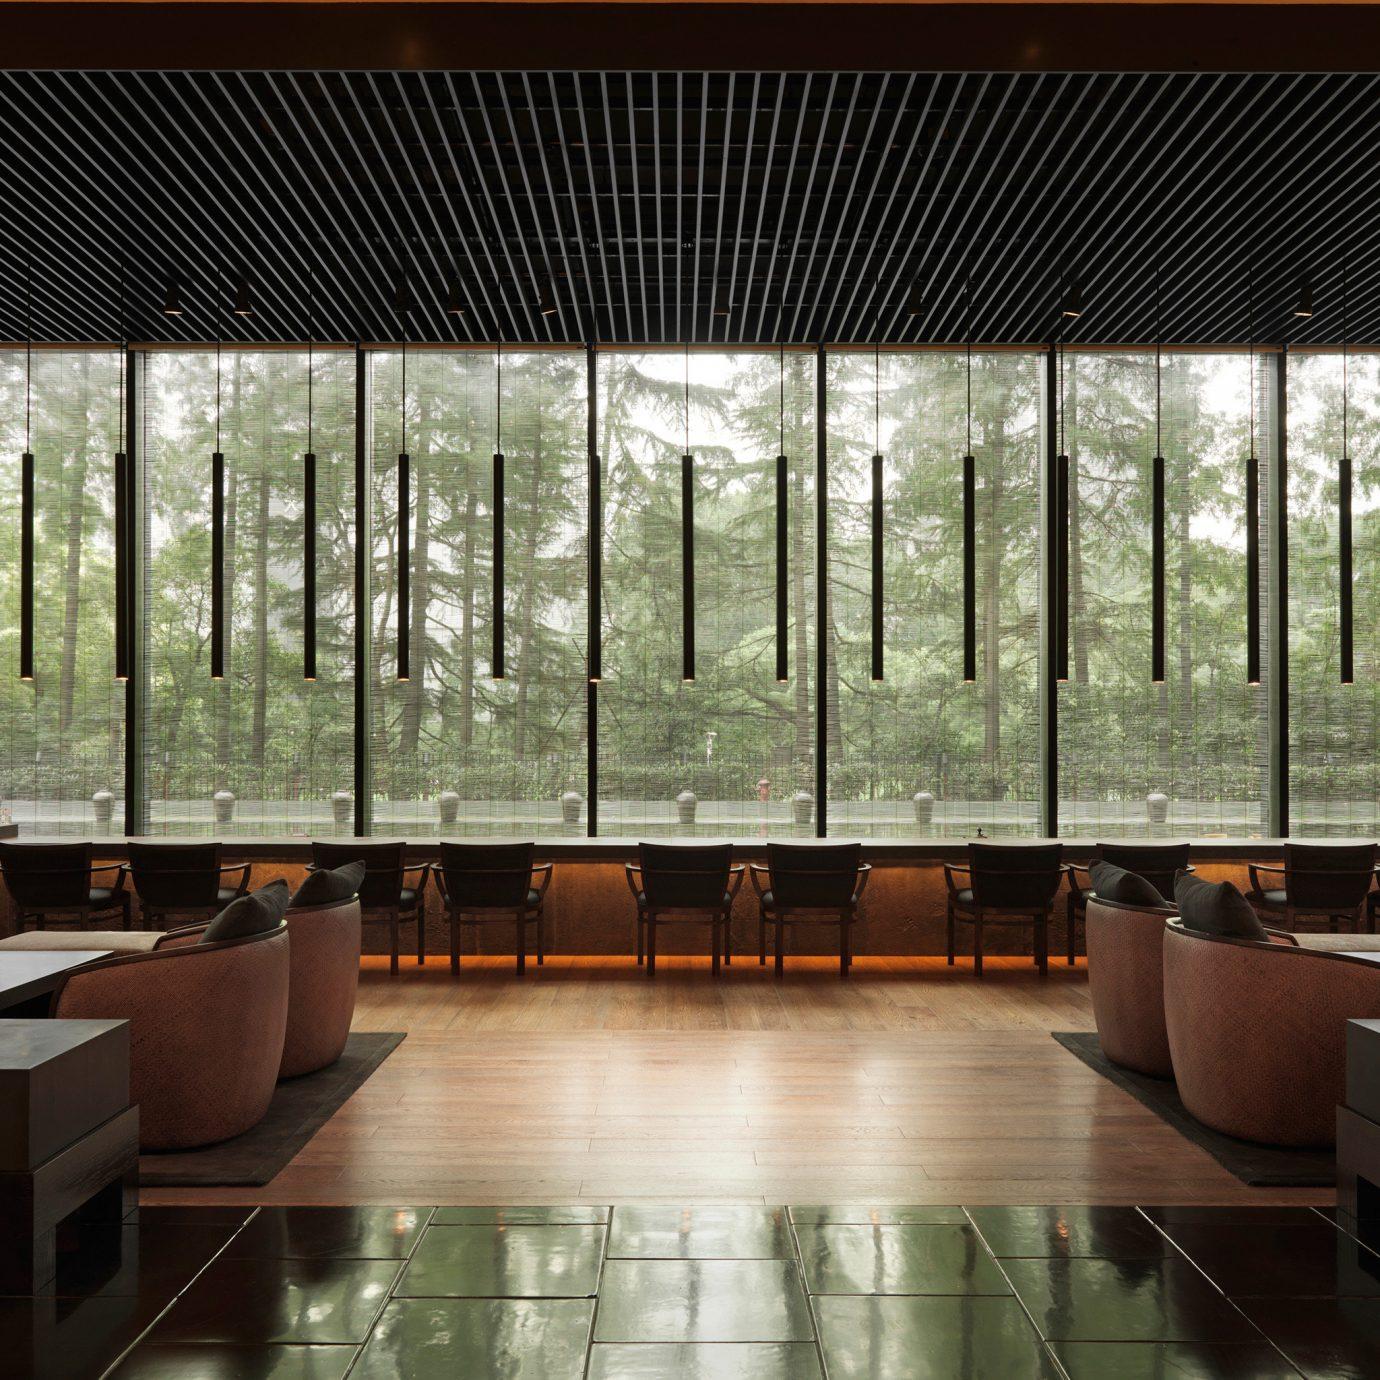 Elegant Hip Hotels Lounge Luxury Modern Trip Ideas Lobby Architecture professional auditorium headquarters